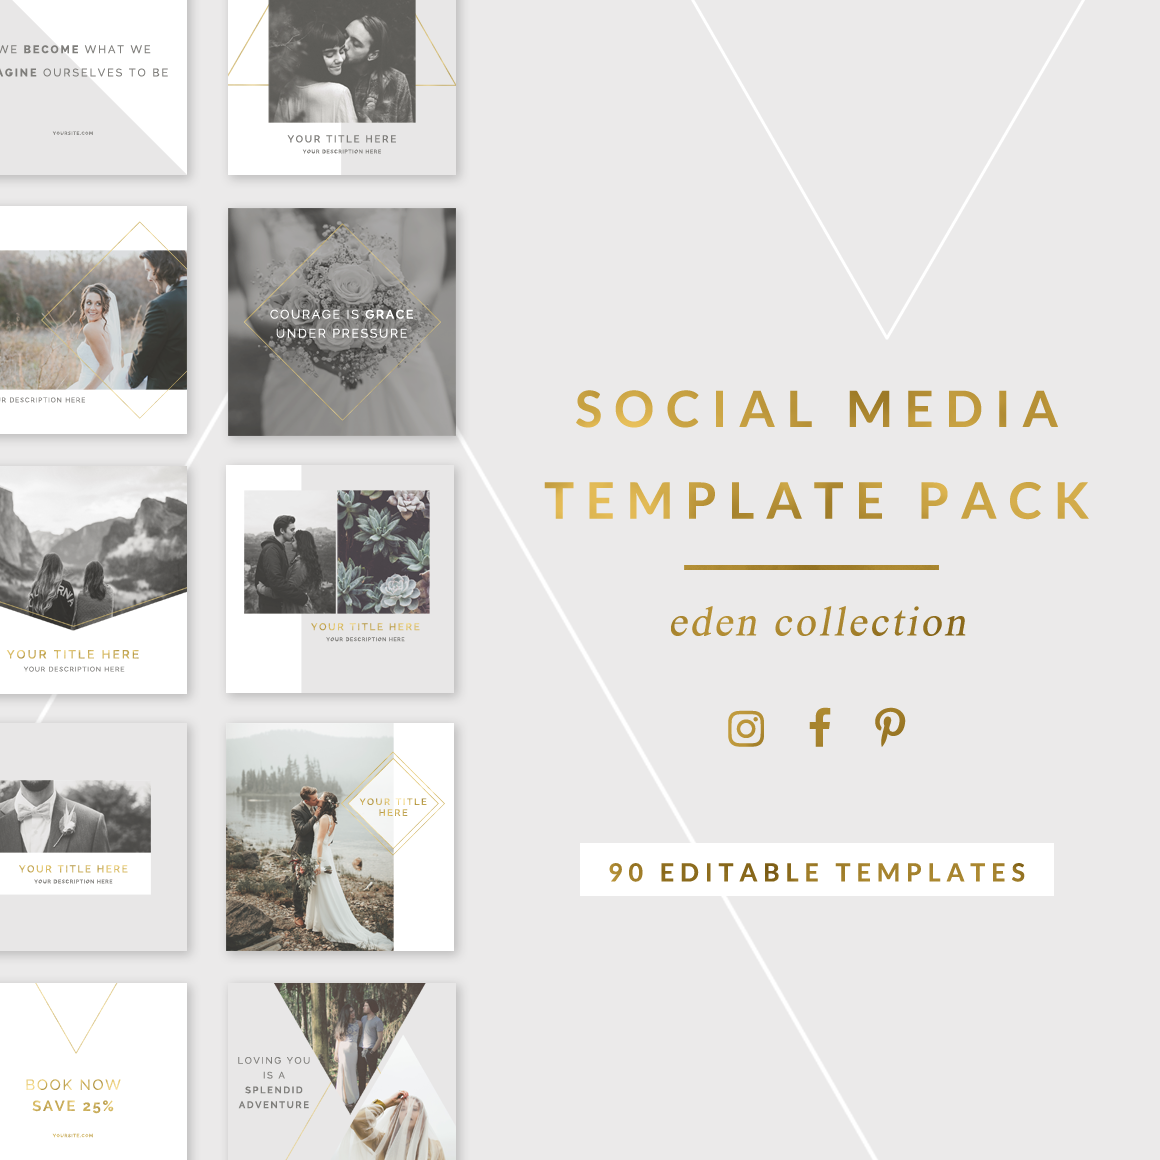 Social media templates for photographers editable templates for instagram photoshop facebook for Social media template psd